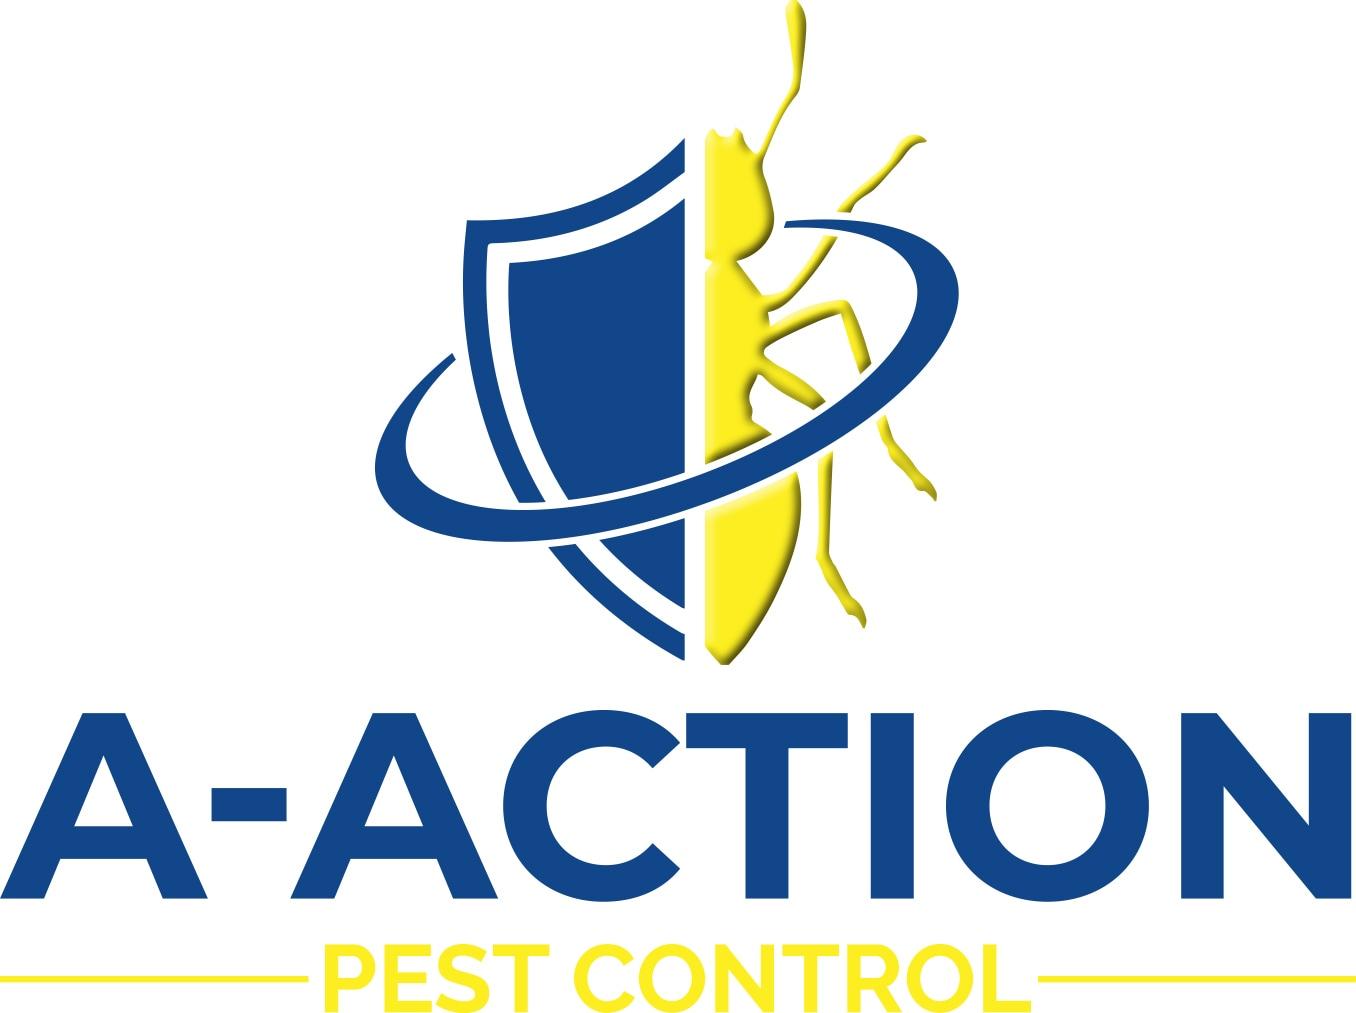 A-Action Pest Control, Inc. logo